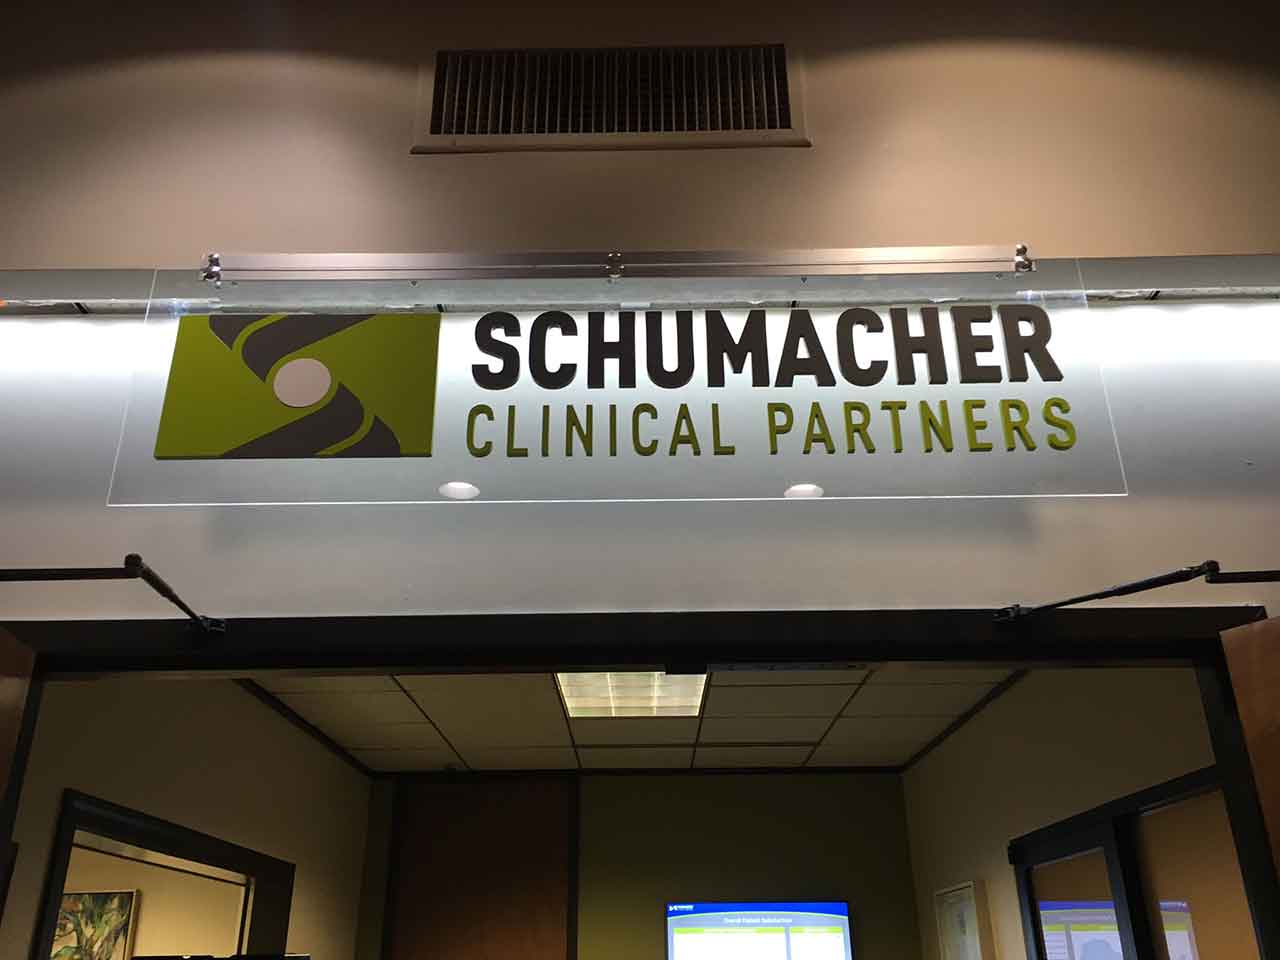 Schumacher interior sign-with custom illumination